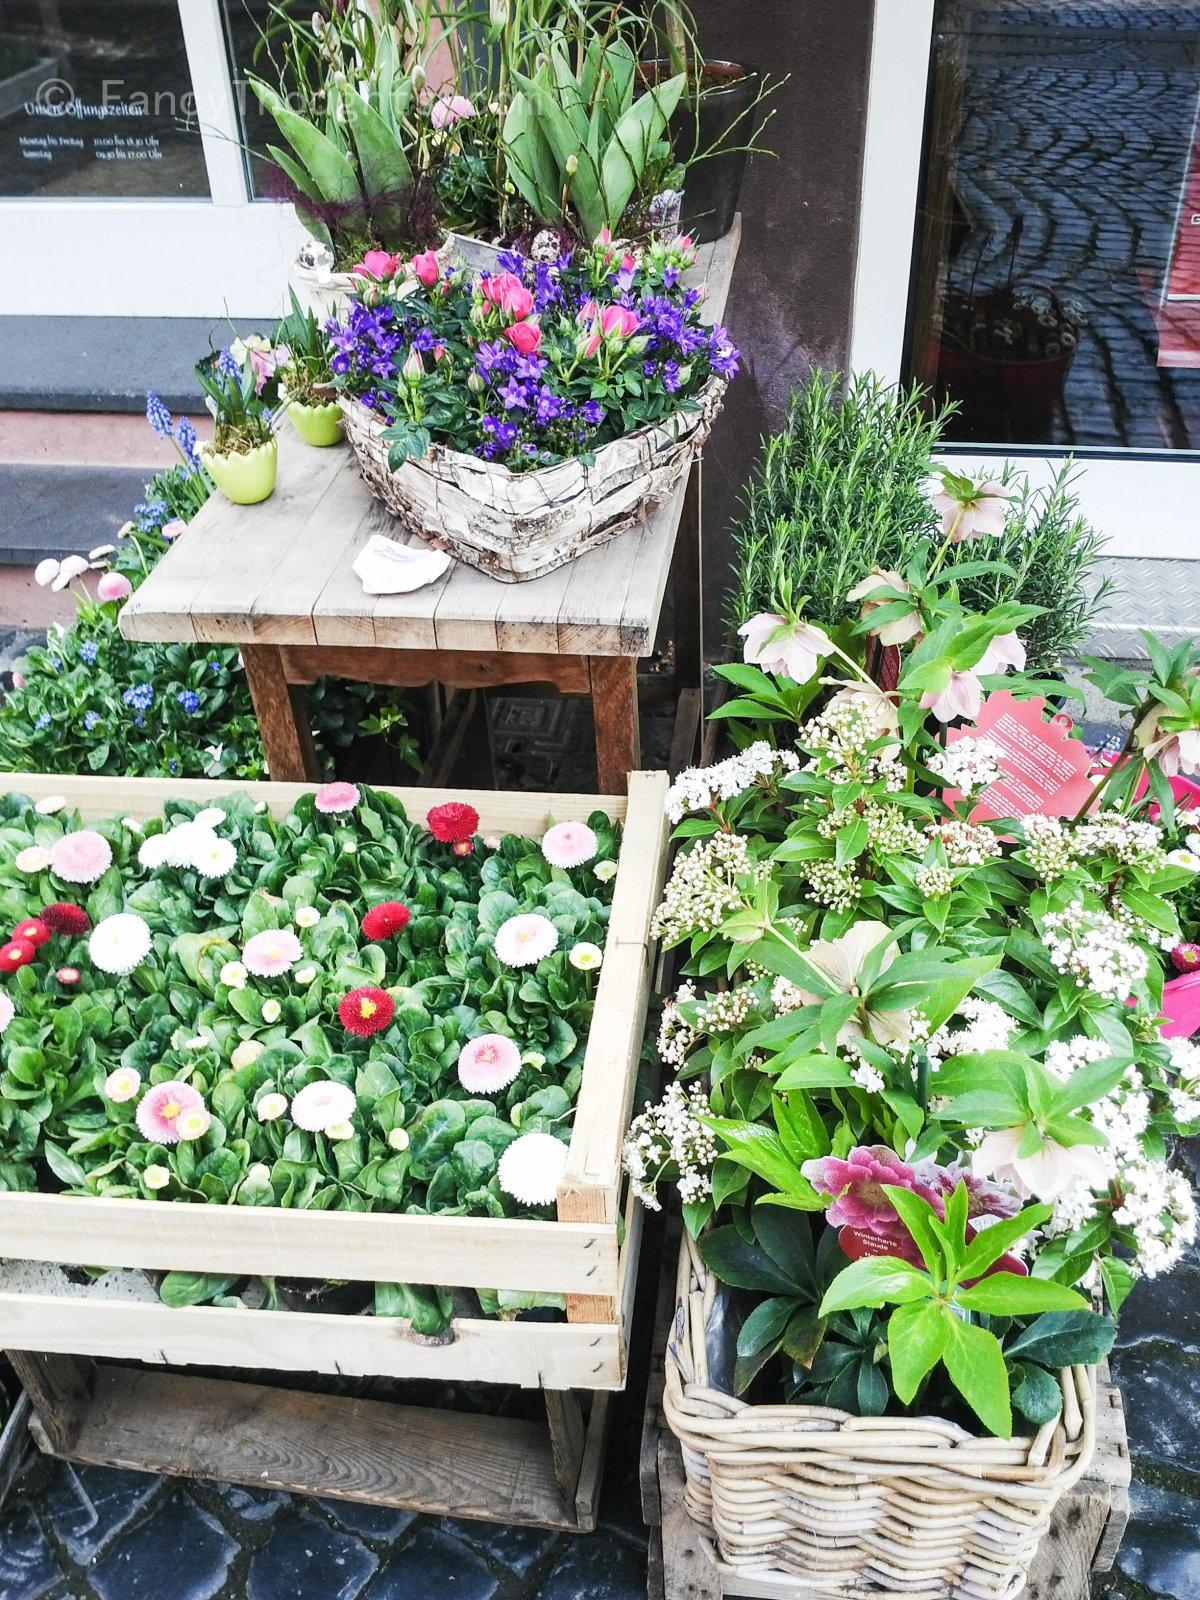 Blumenladen_Mainz